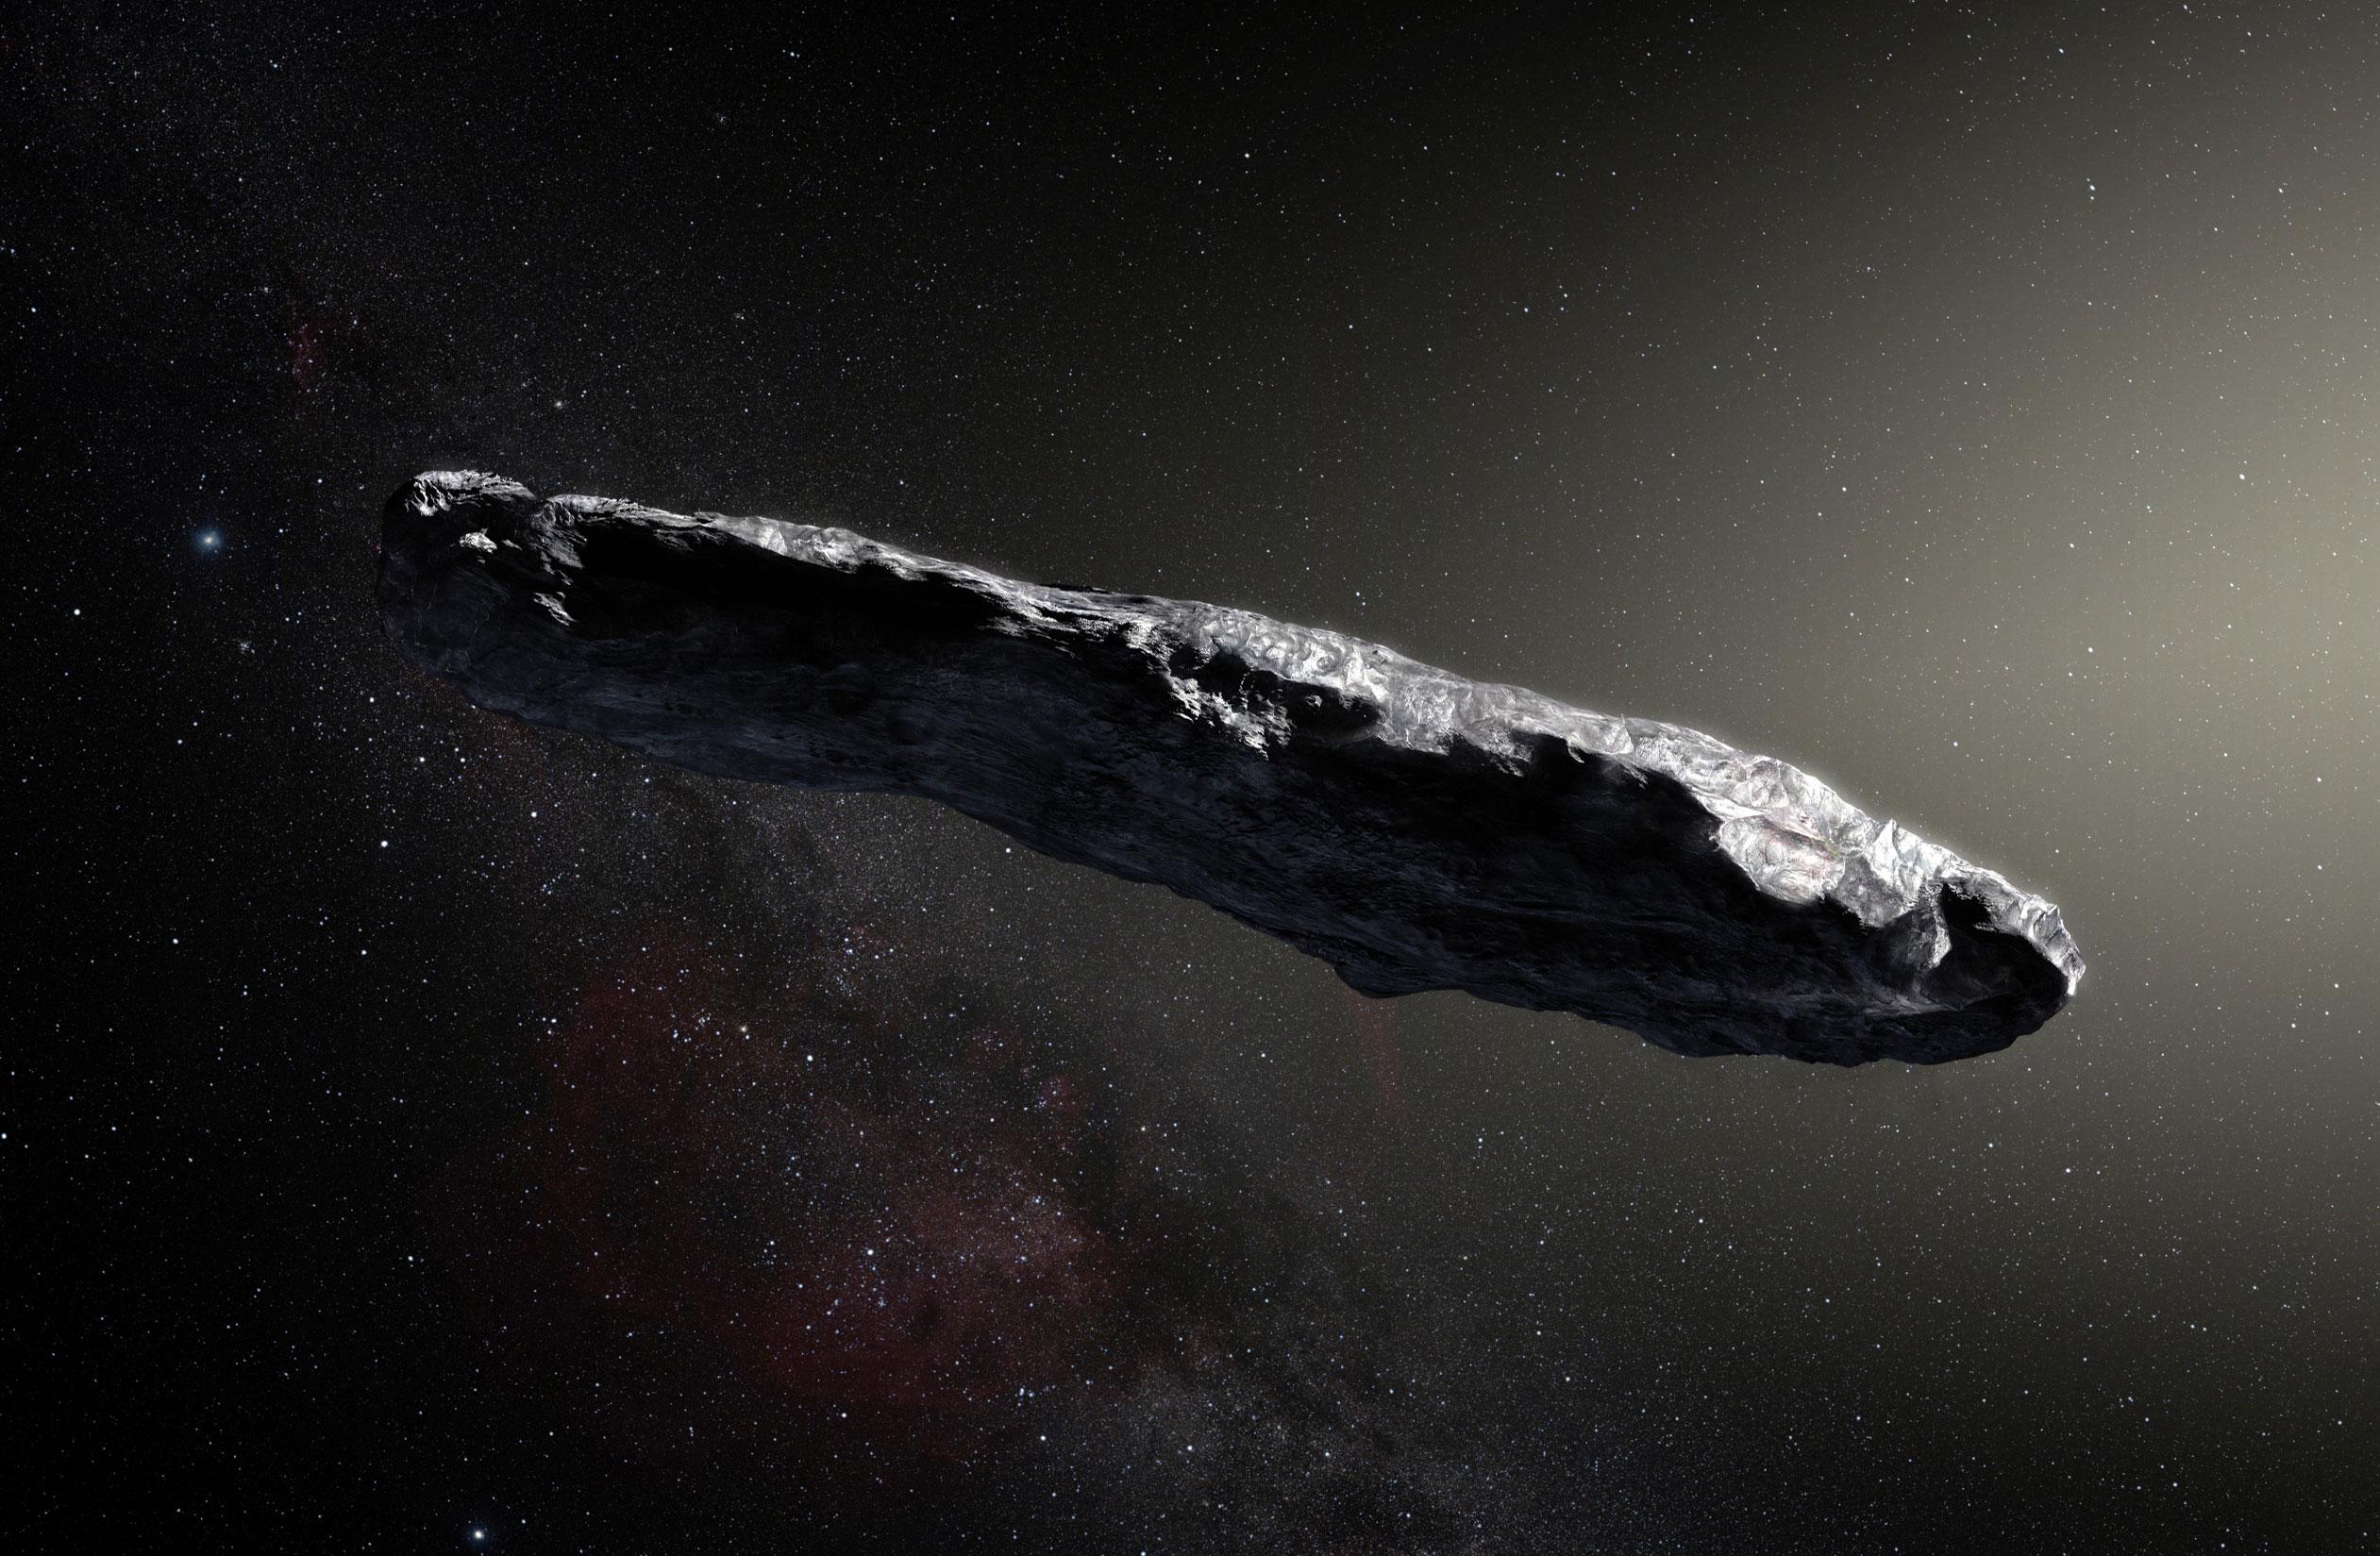 'Oumuamua: Wikimedia